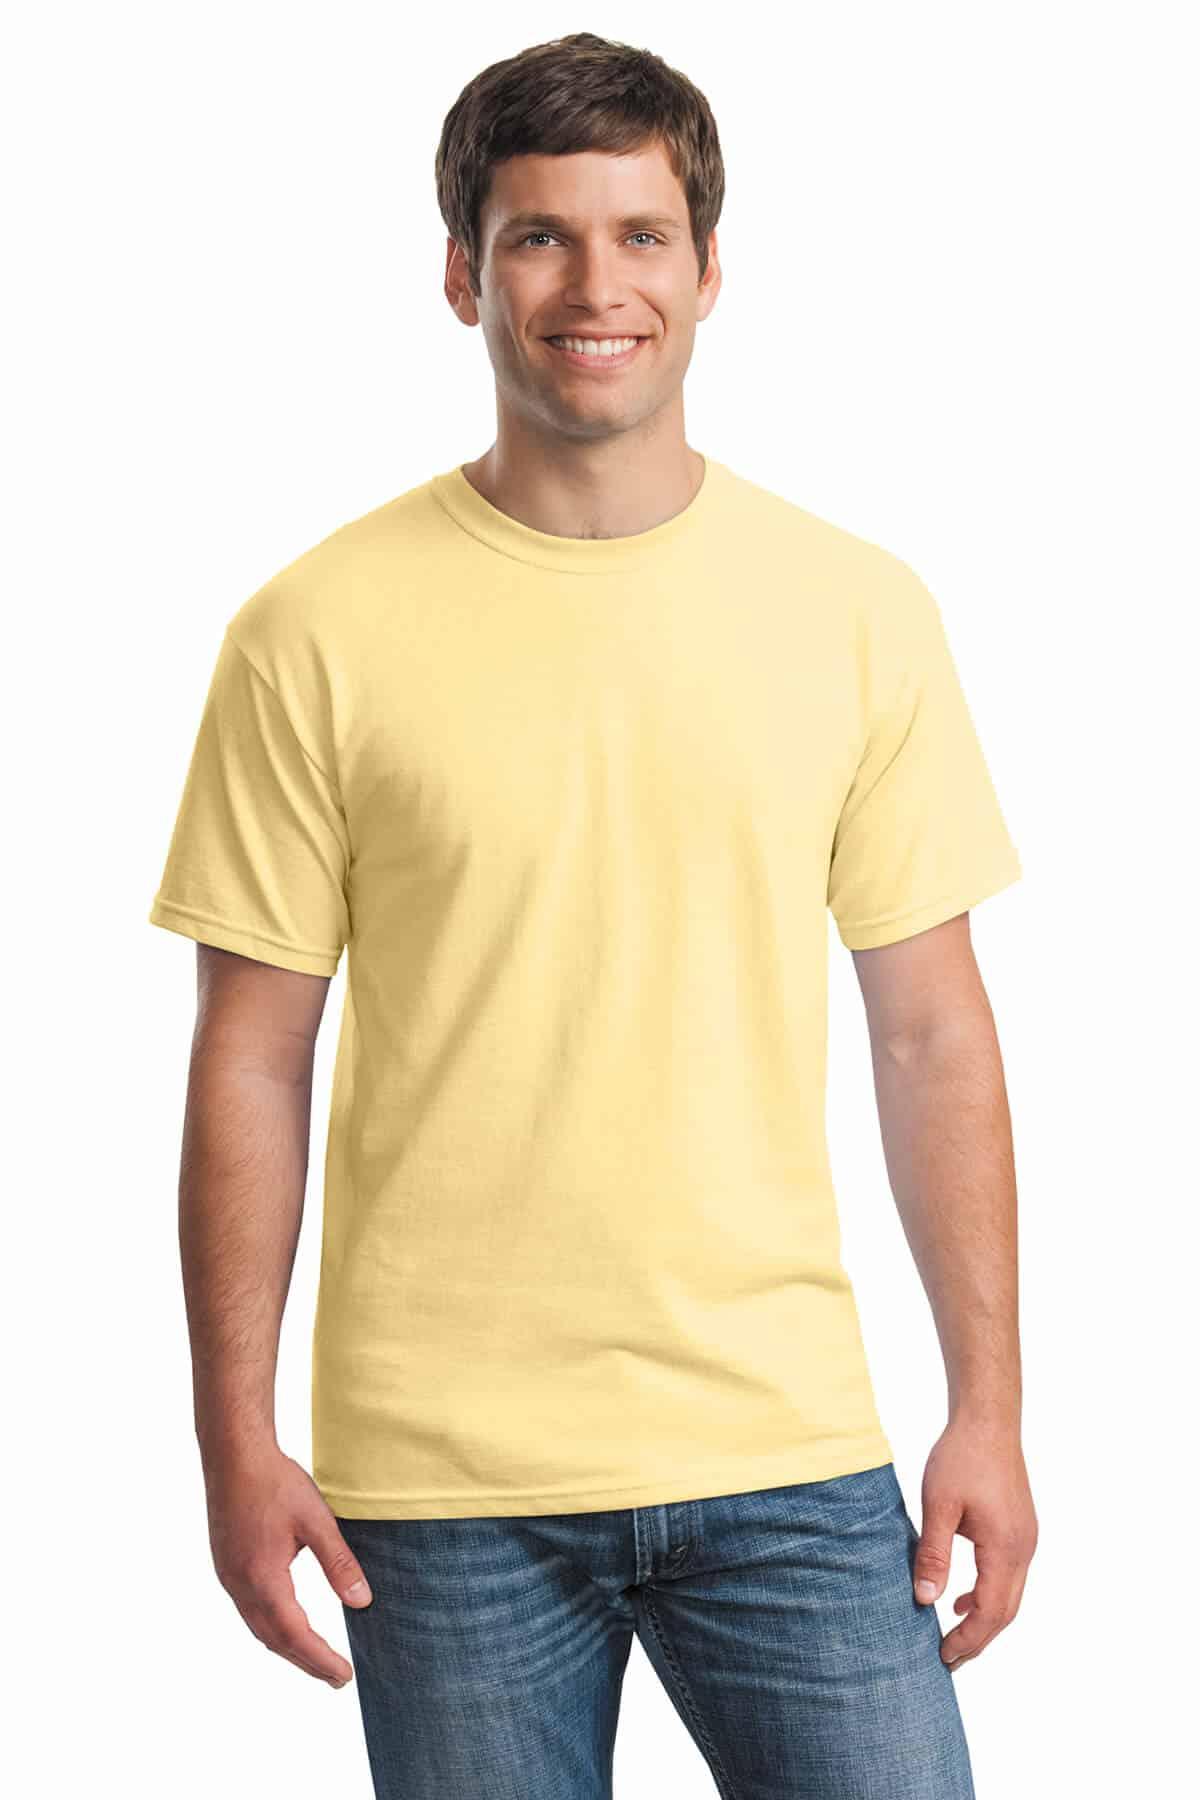 Yellow Haze Tee Front